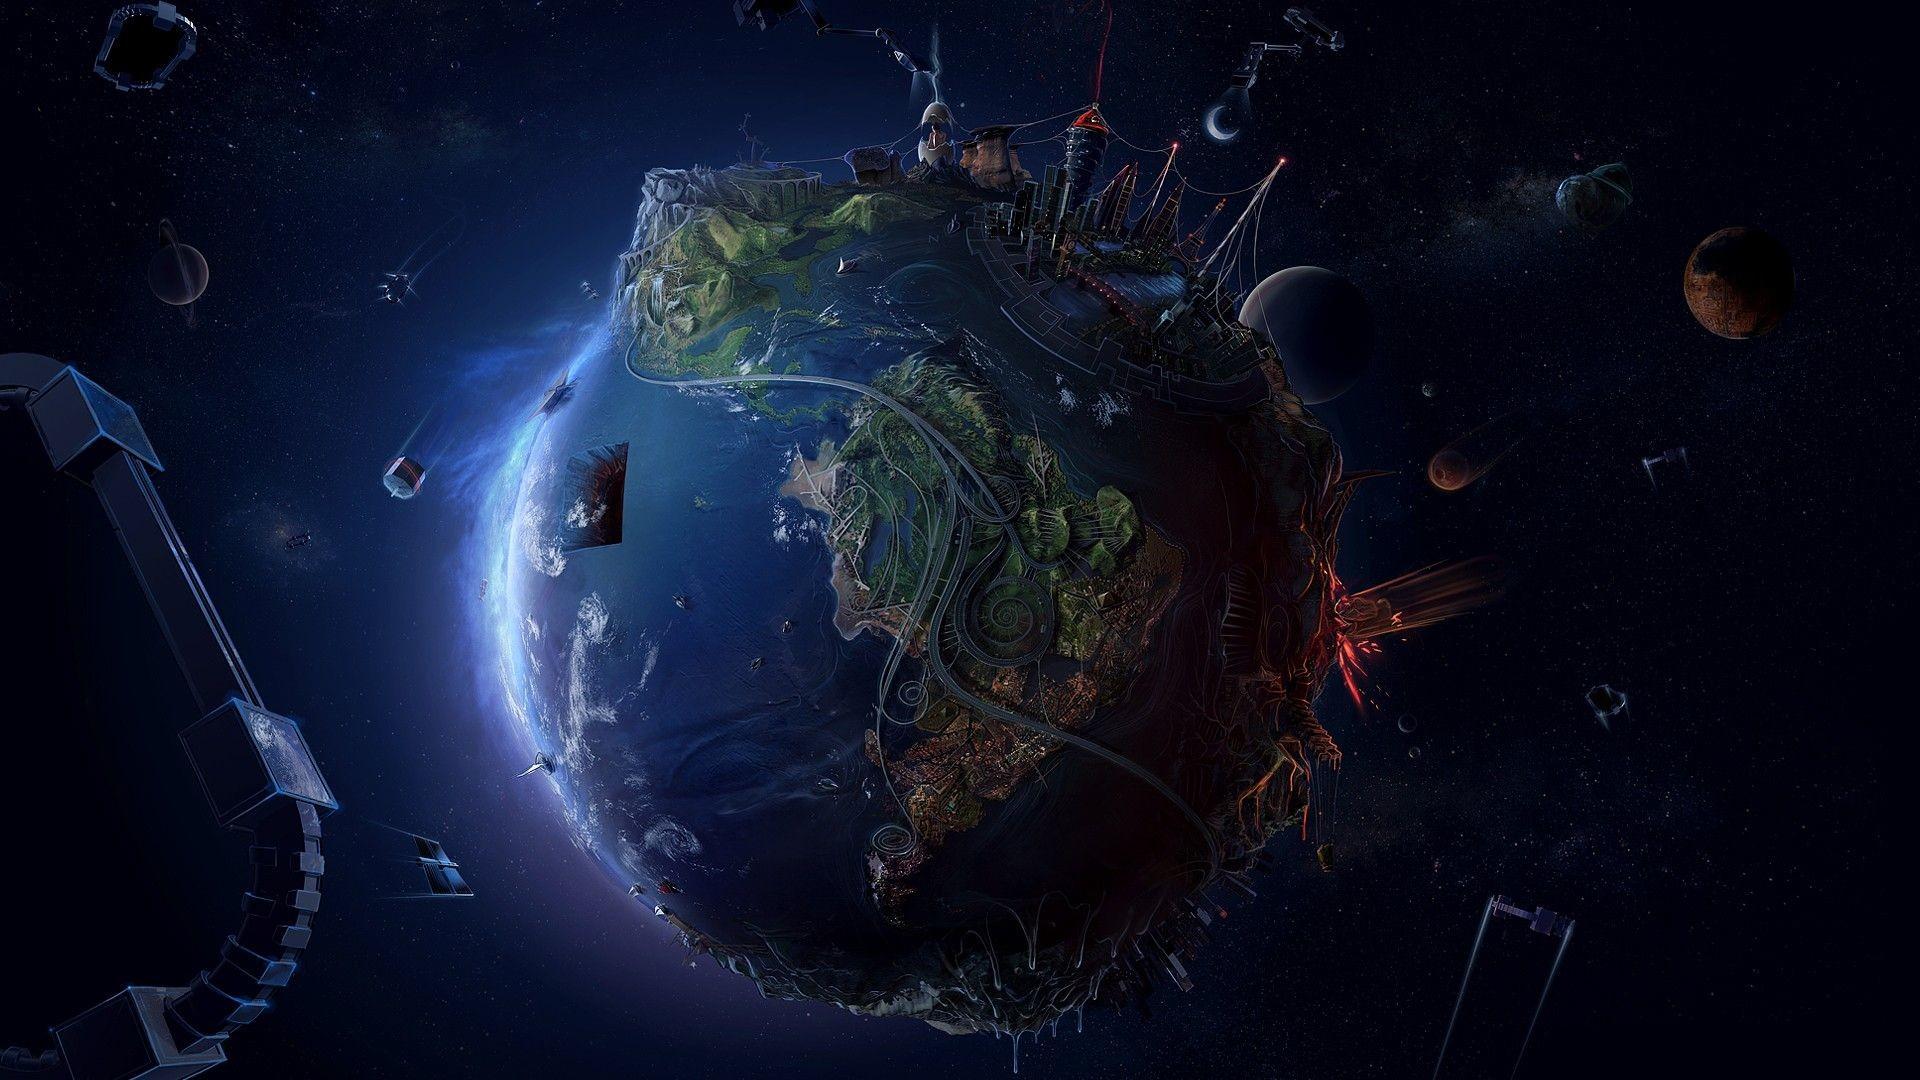 Space Galaxy Desktop Wallpapers